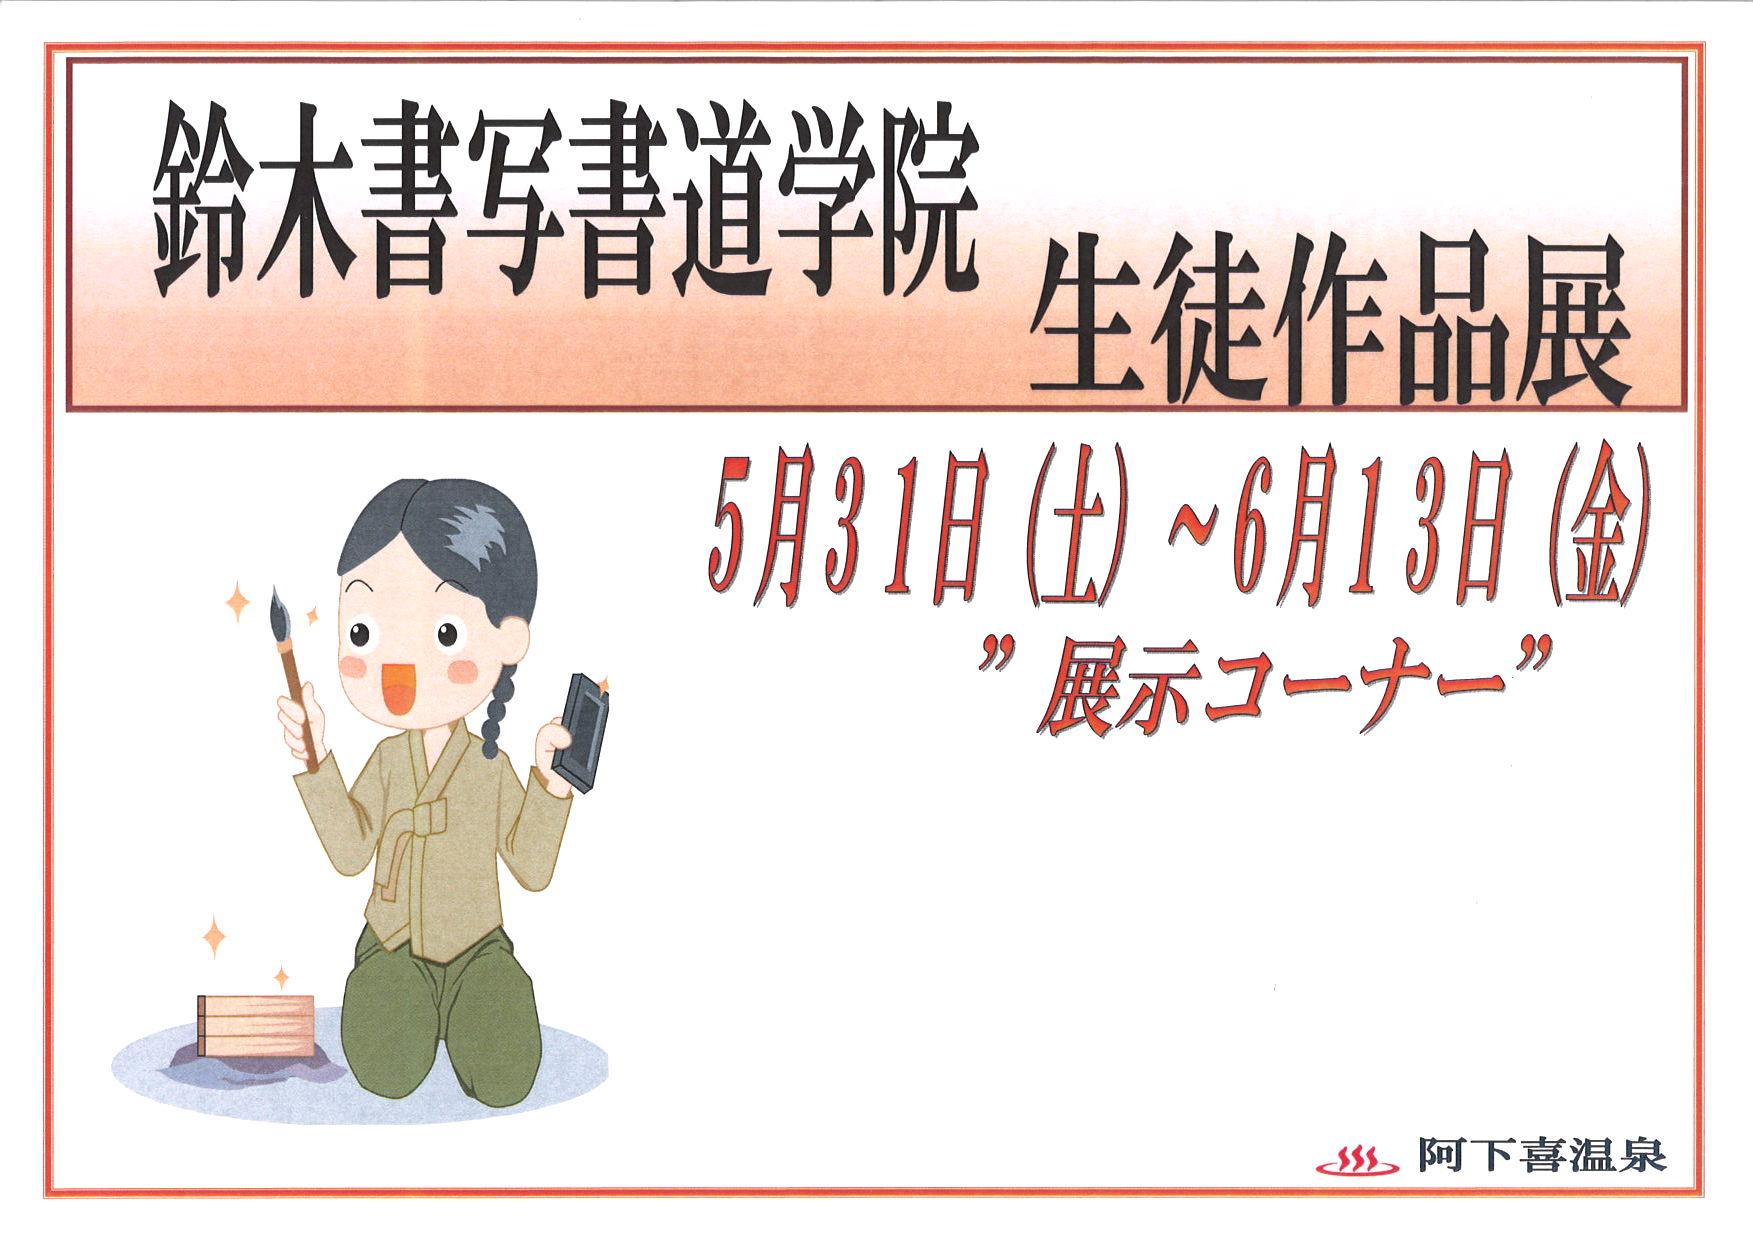 http://www.ajisainosato.com/info/images/20140528172455_00001.jpg